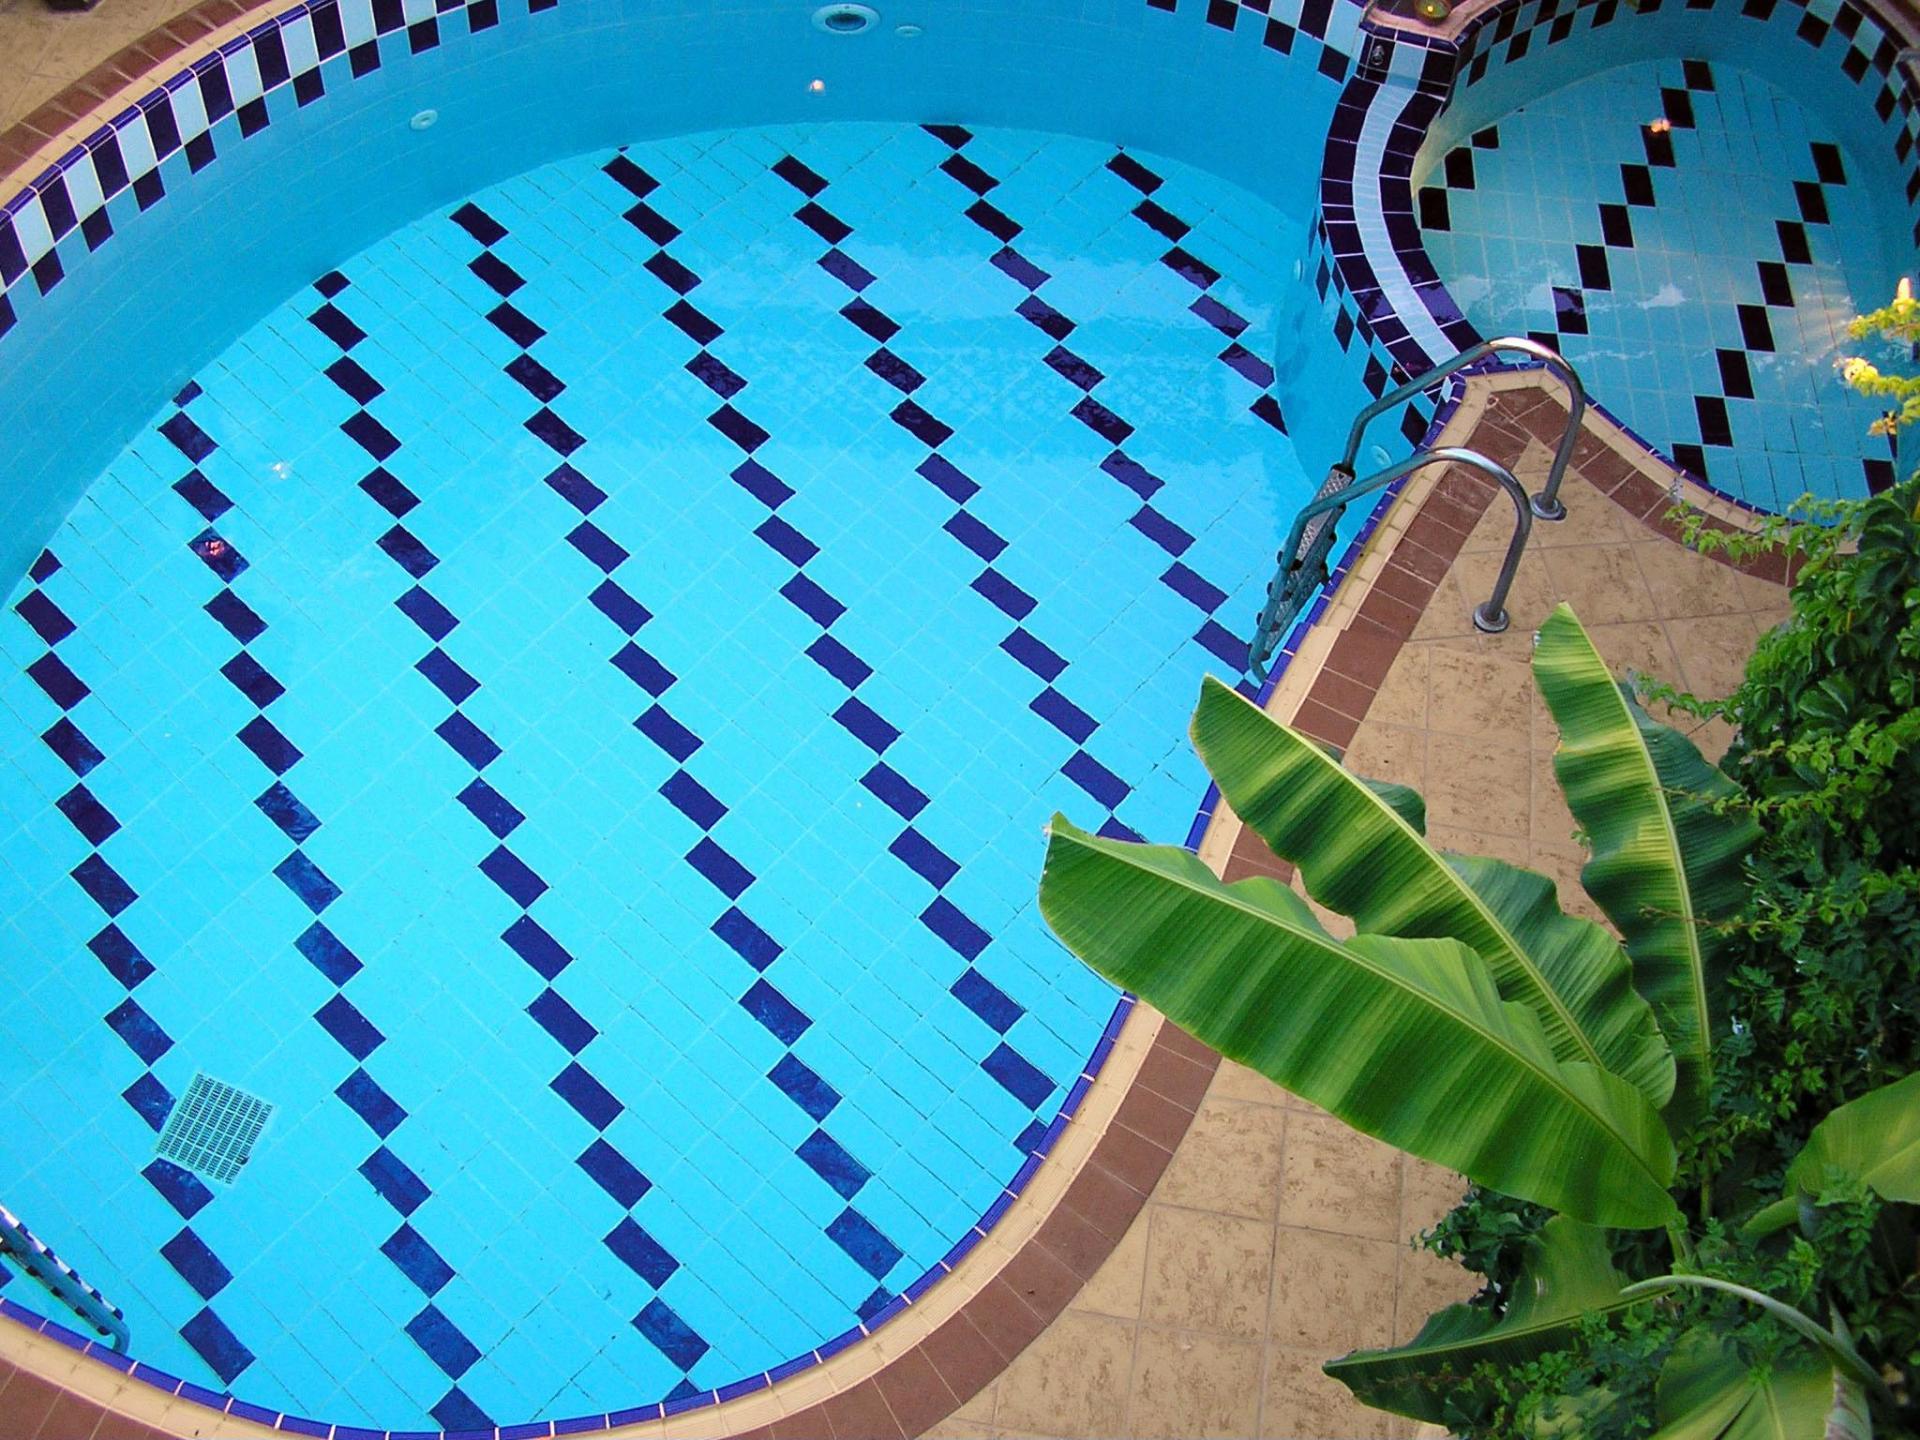 34m2 pool+ kids pool